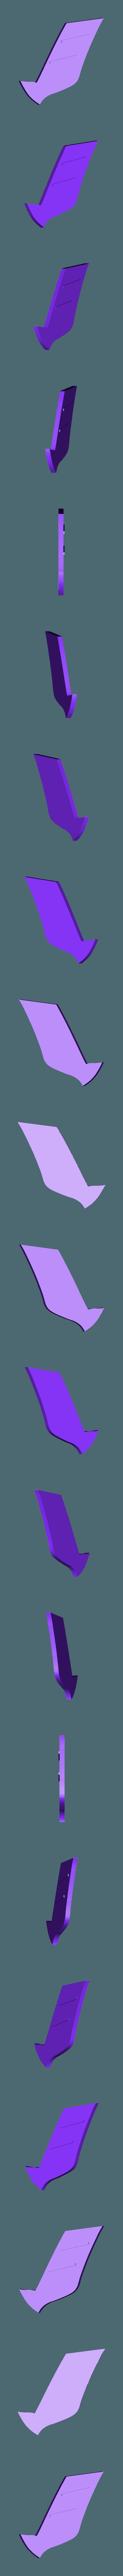 Floor_02.stl Download free STL file Metaphor • 3D printing template, JayOmega